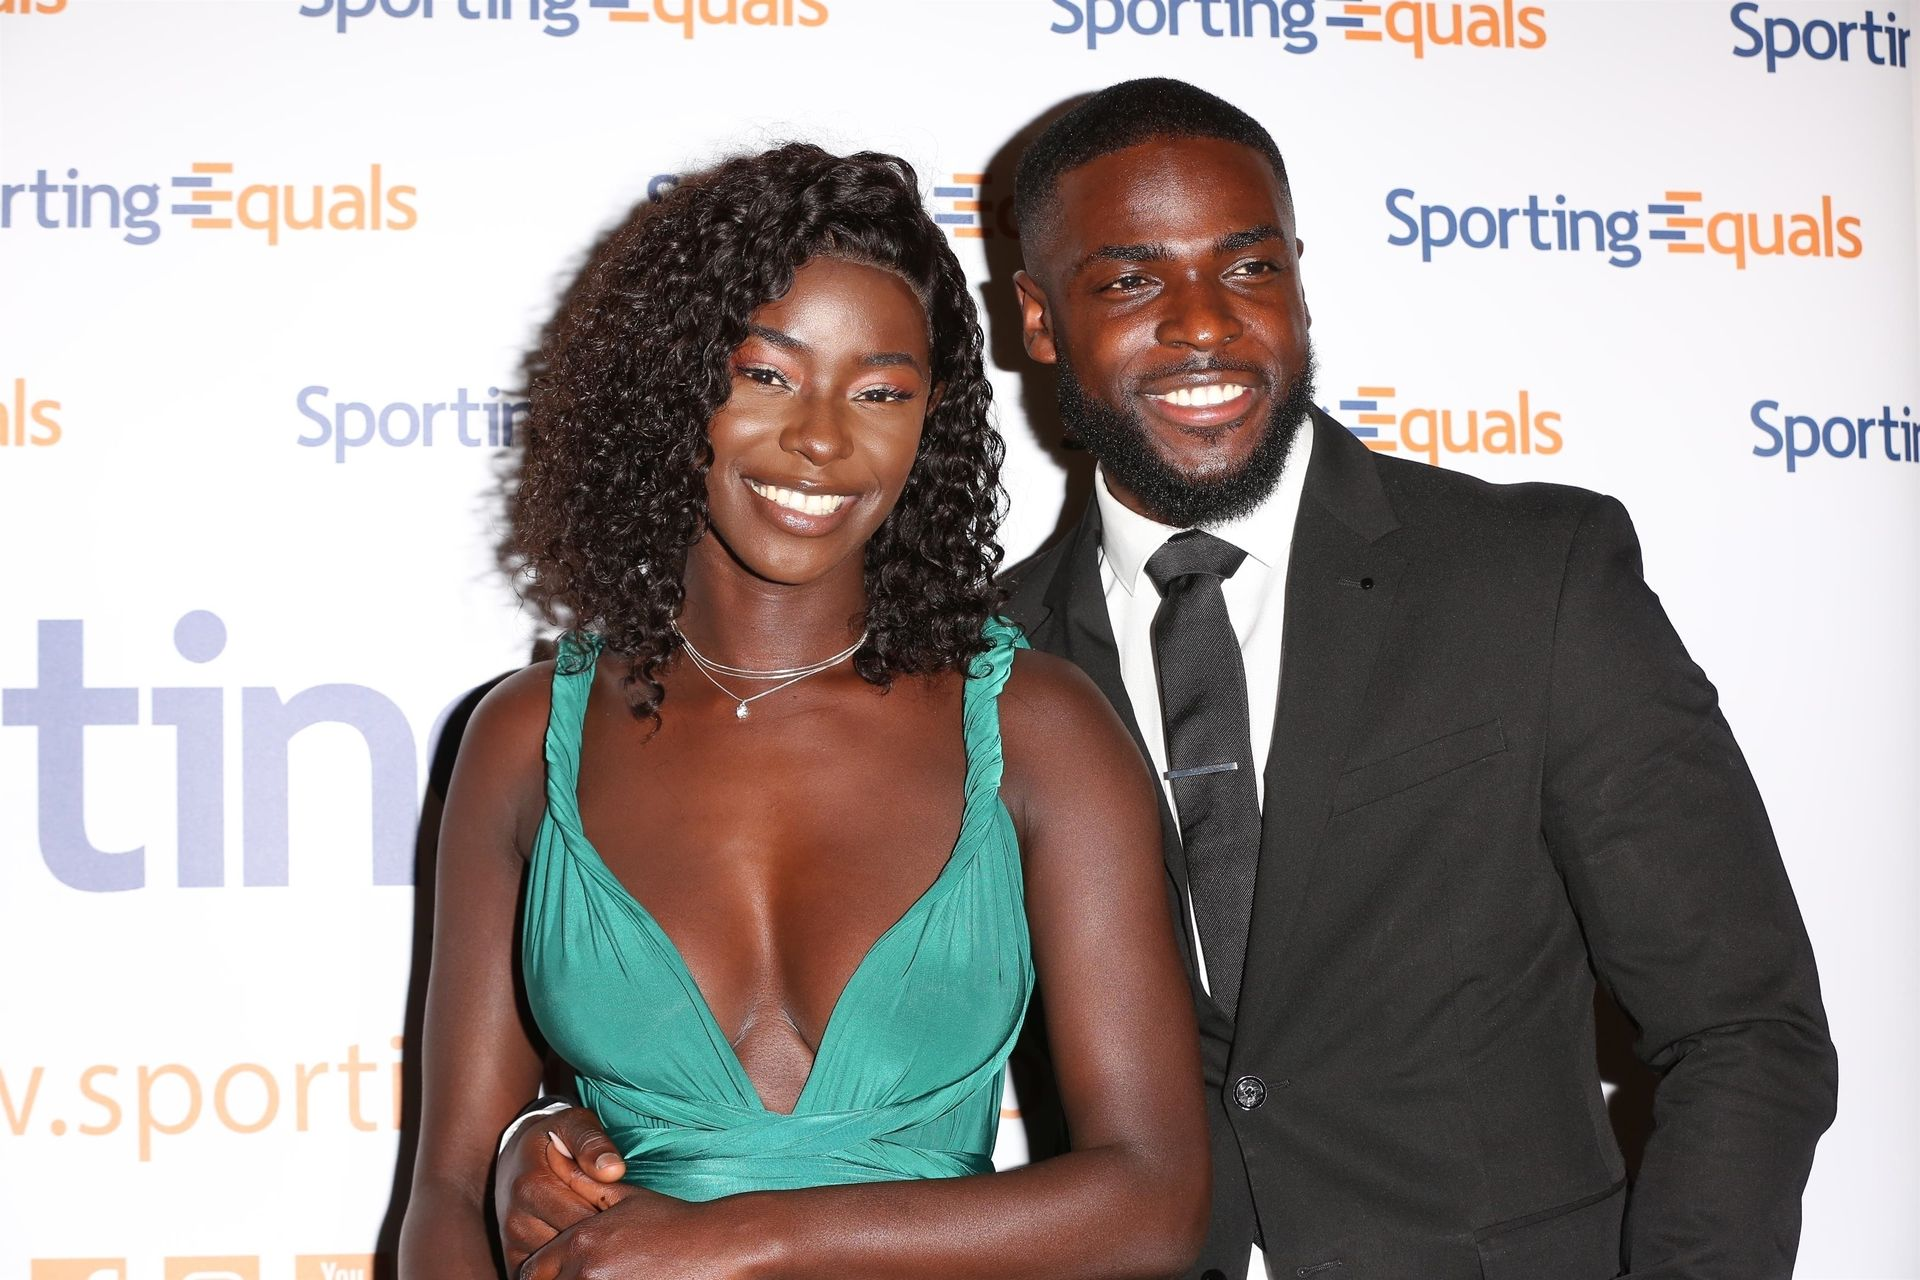 Mike Boateng & Priscilla Anyabu Are Seen At British Ethnic Diversity Sports Awards 0116